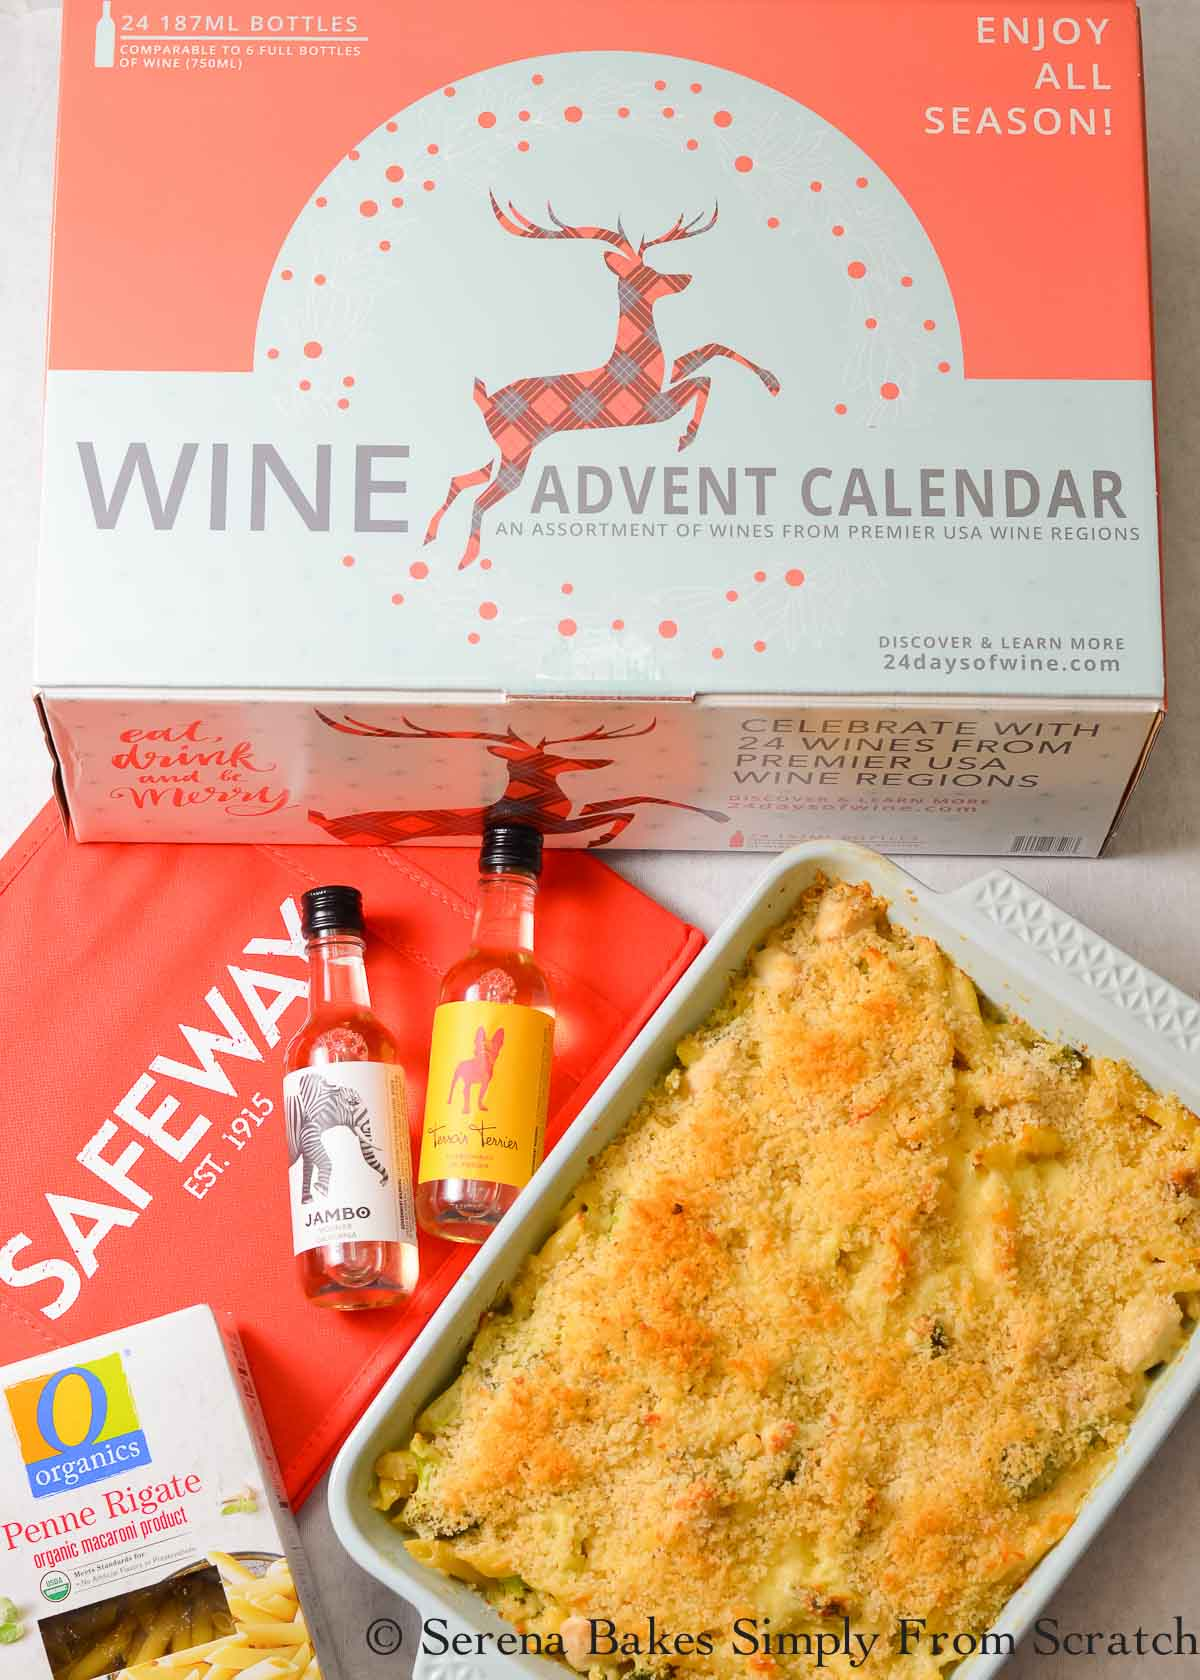 Chicken Broccoli Casserole with Panko Bread Crumbs and a Wine Advent Calendar.